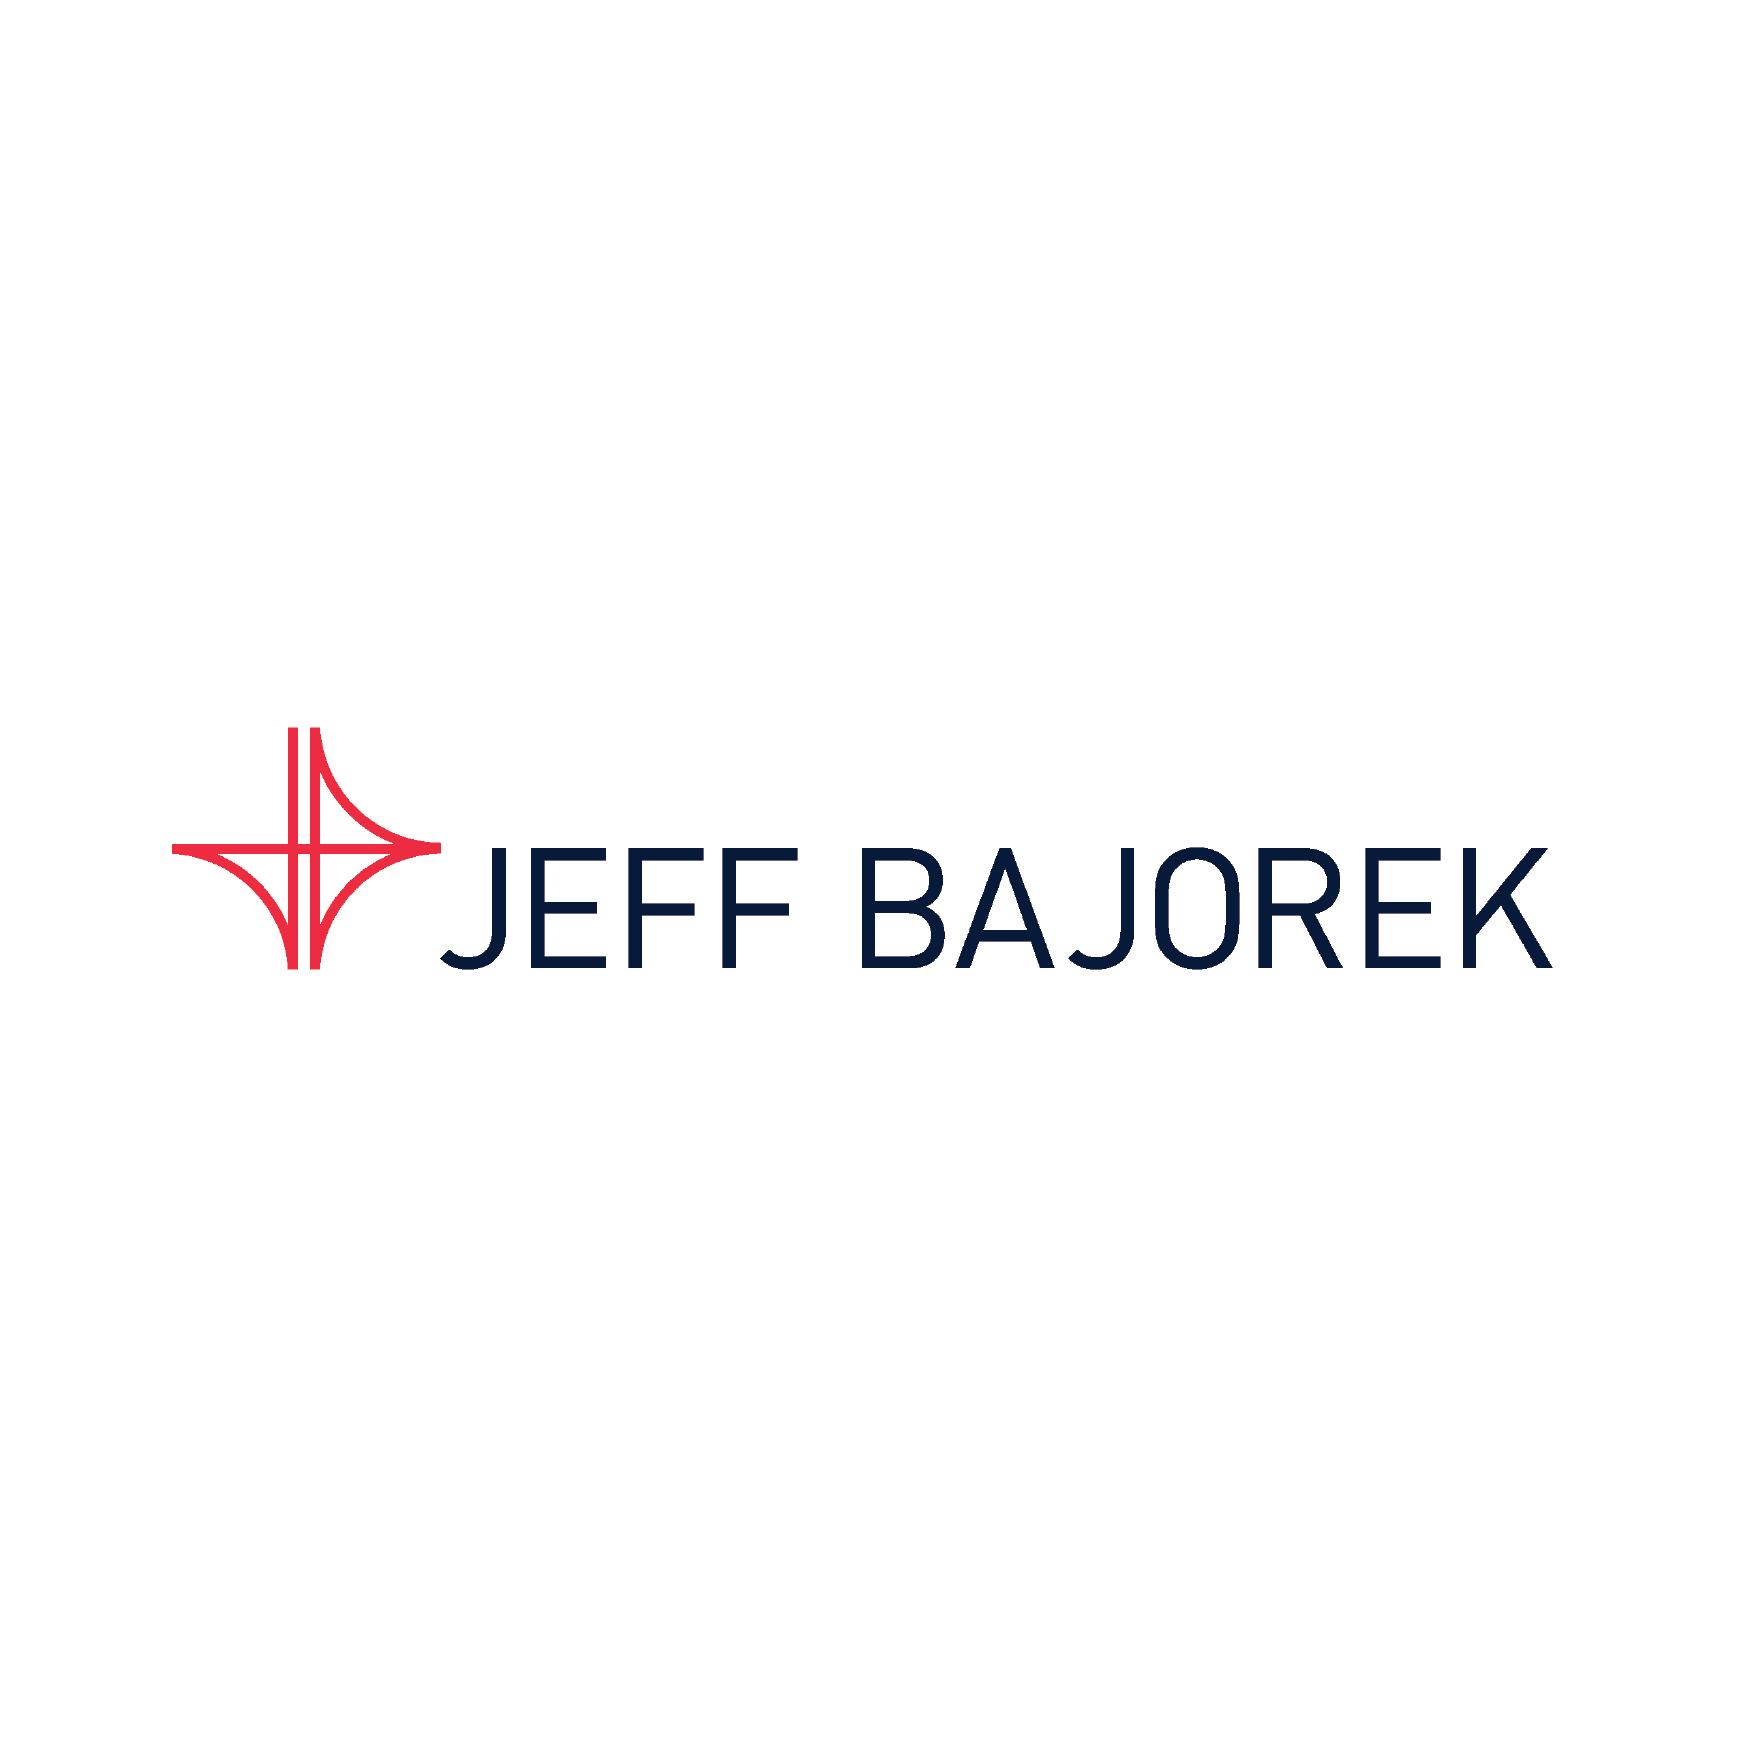 Copy of Jeff Bajorek